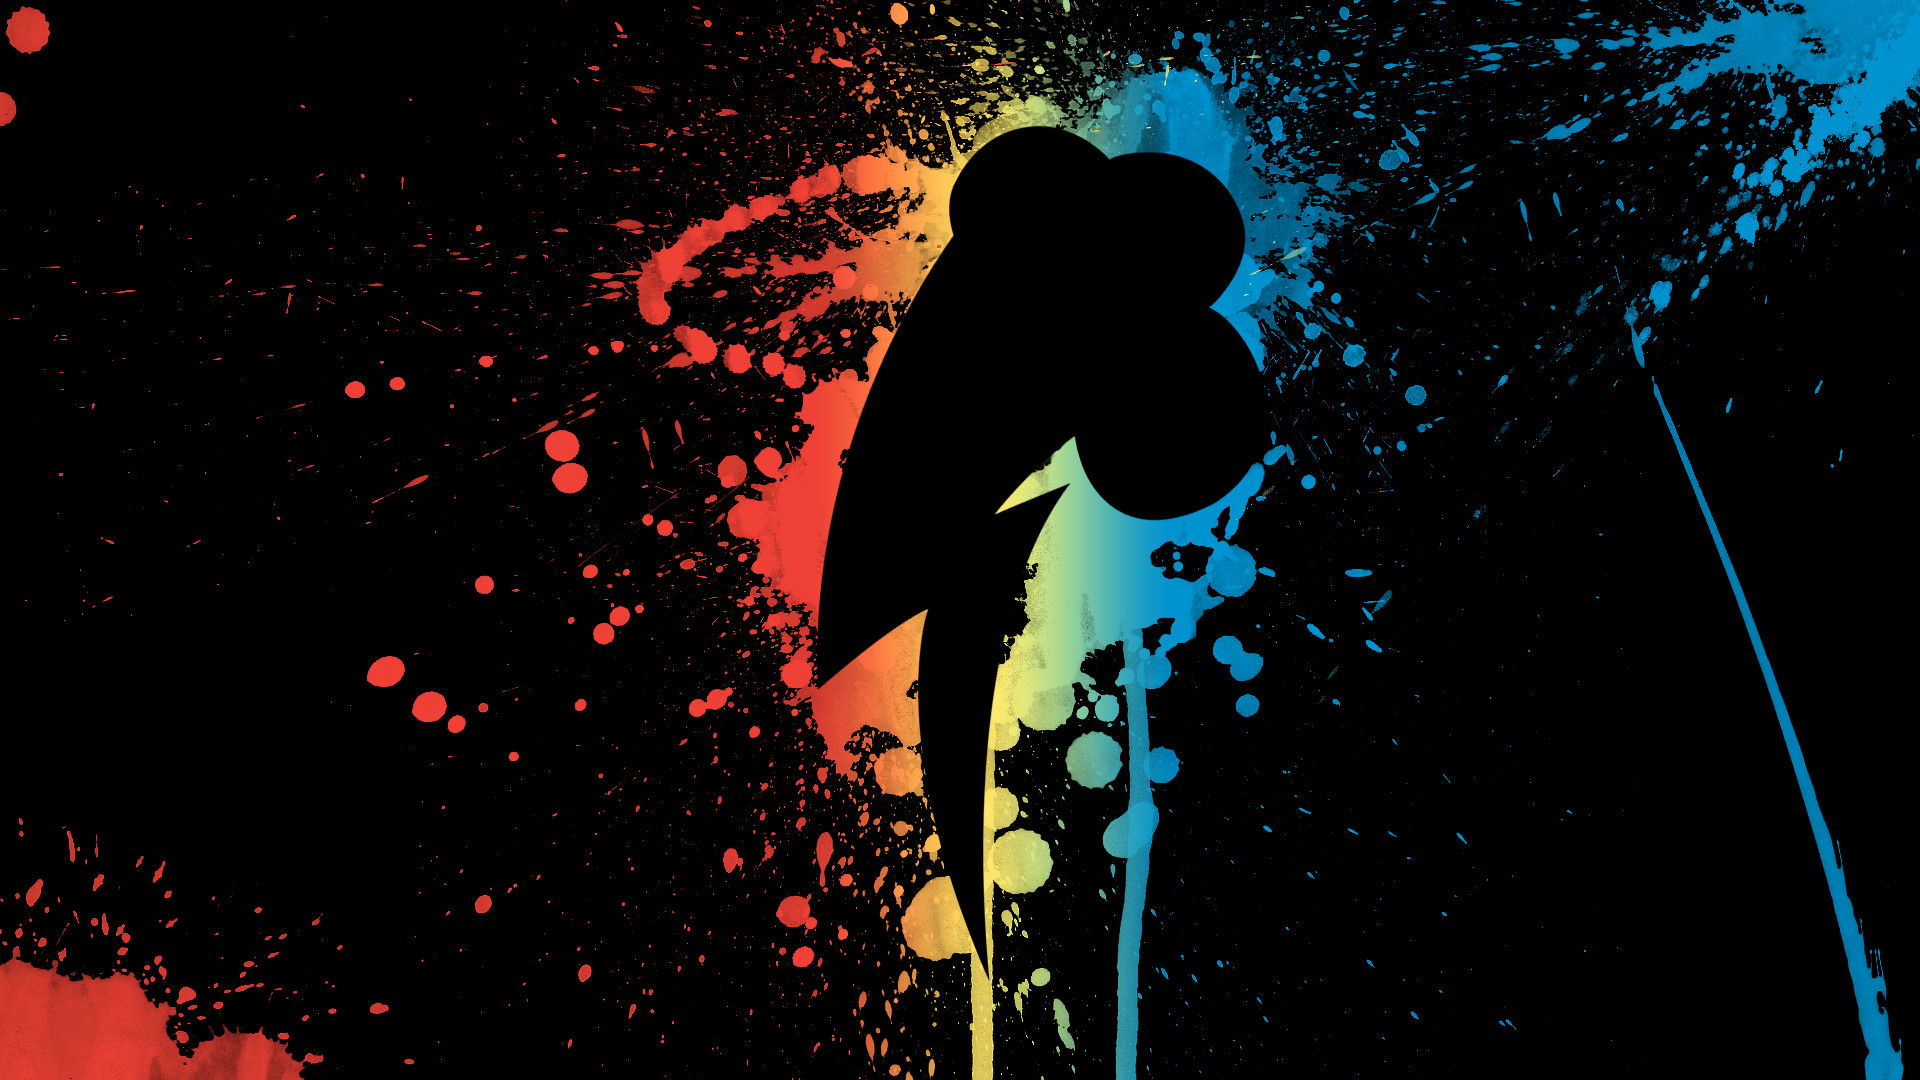 CCD947: My Little Pony Rainbow Dash, 1920×1080, by Alayna Lott